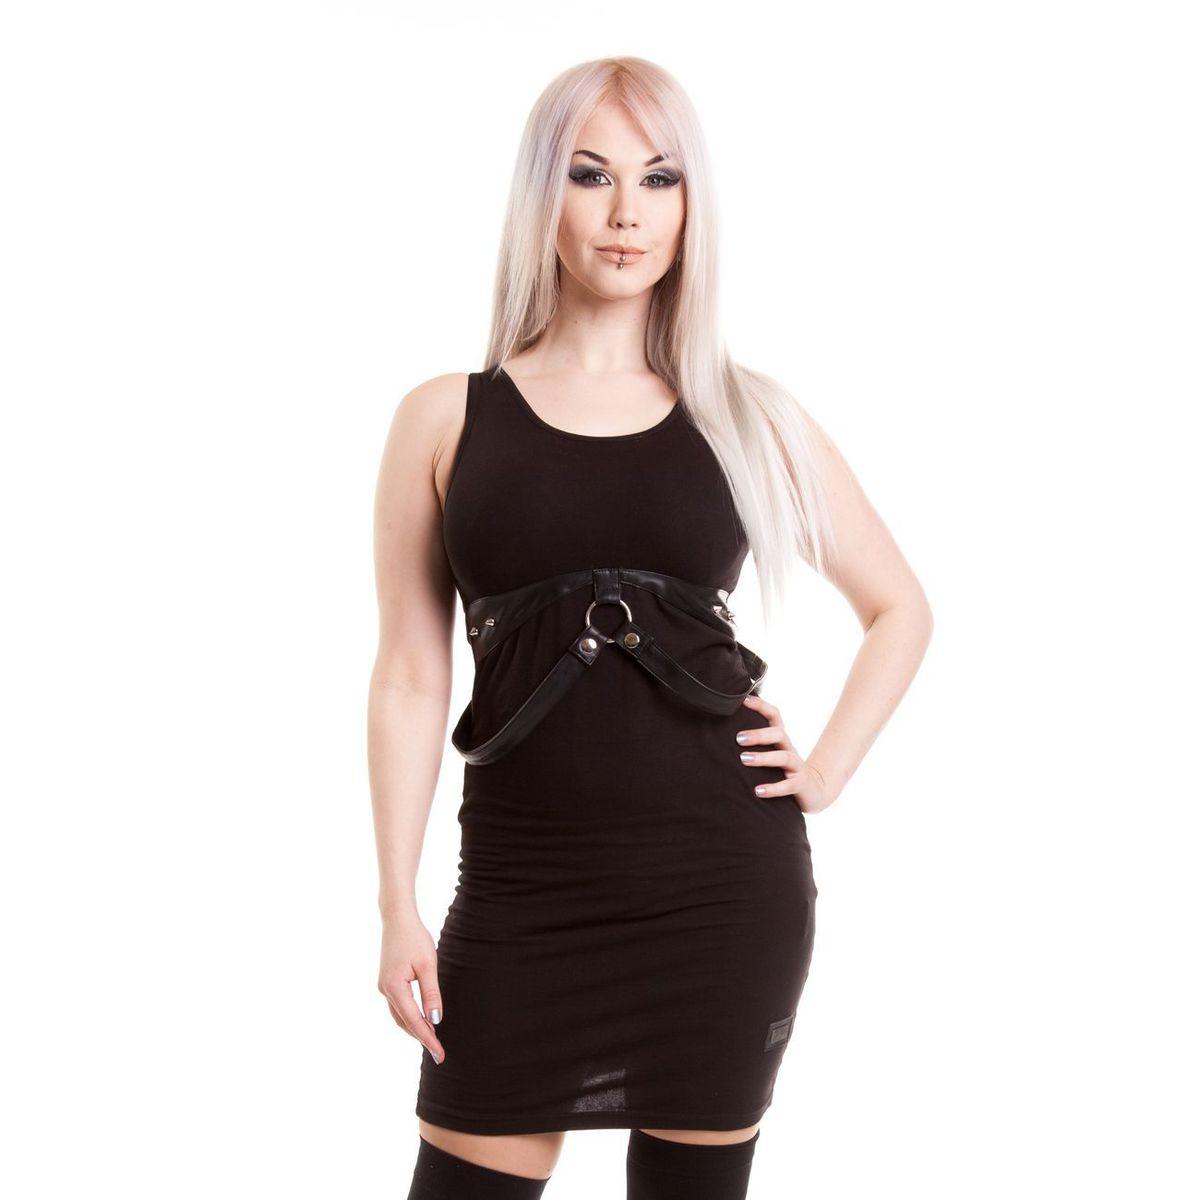 šaty dámske VIXXSIN - Voyage - Black - POI120 - metalshop.sk 5570fa21401